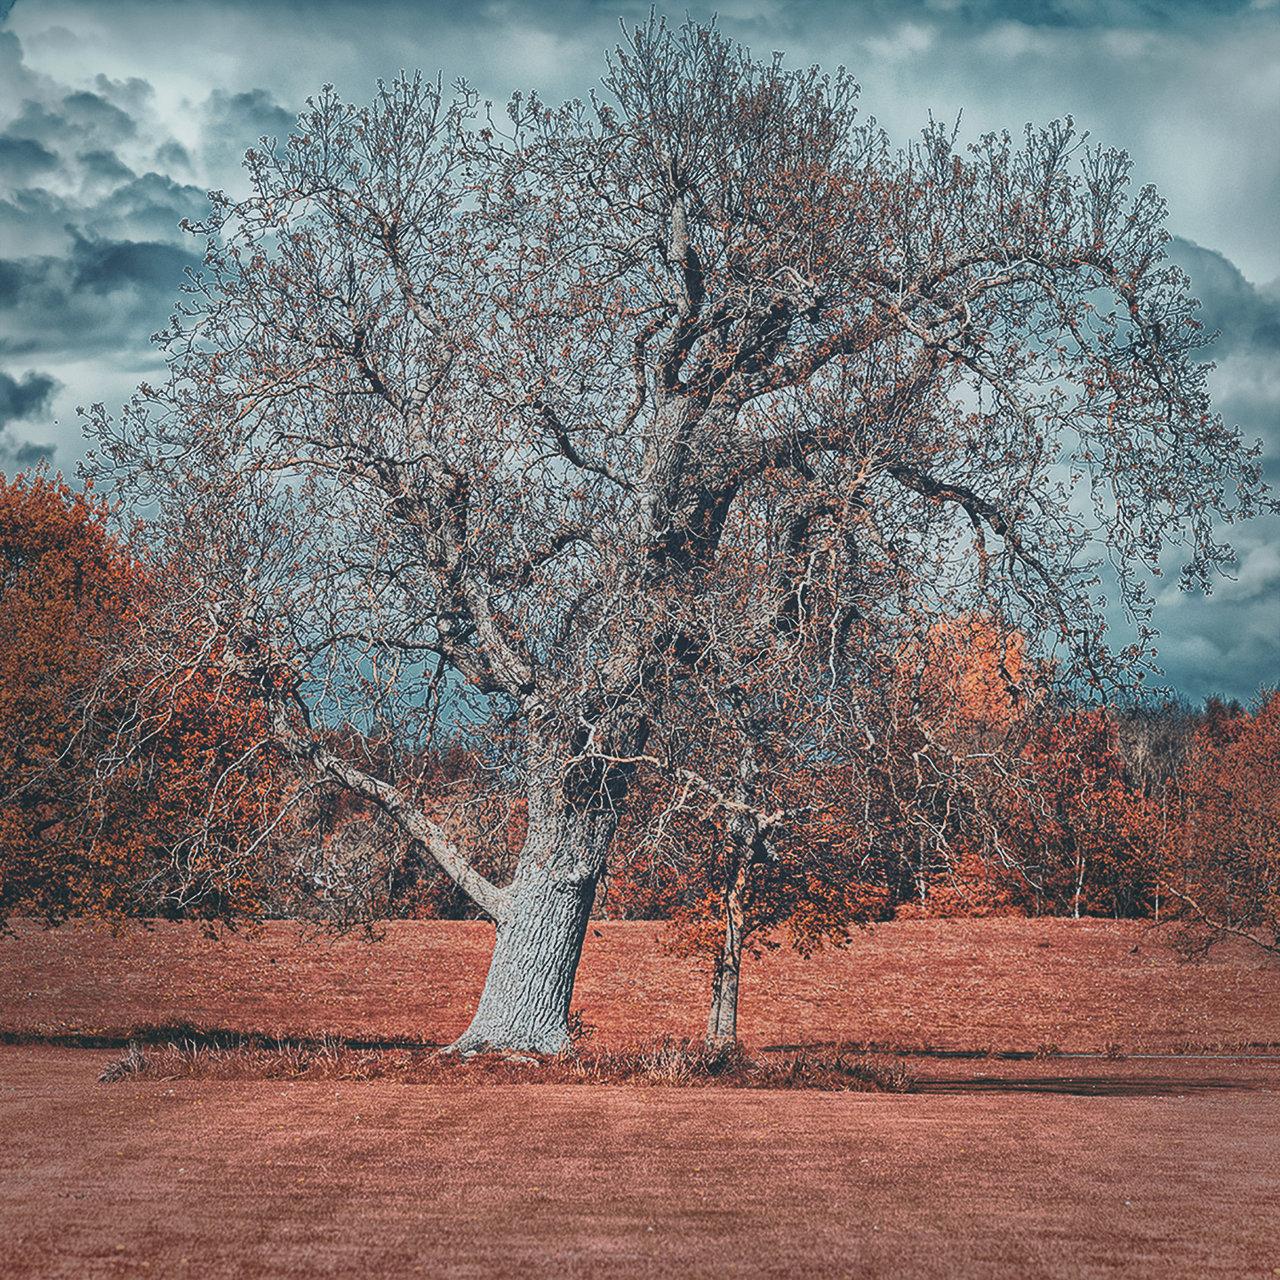 Photo in Nature | Author Krastyu Vasilev - Mr.Chaos | PHOTO FORUM